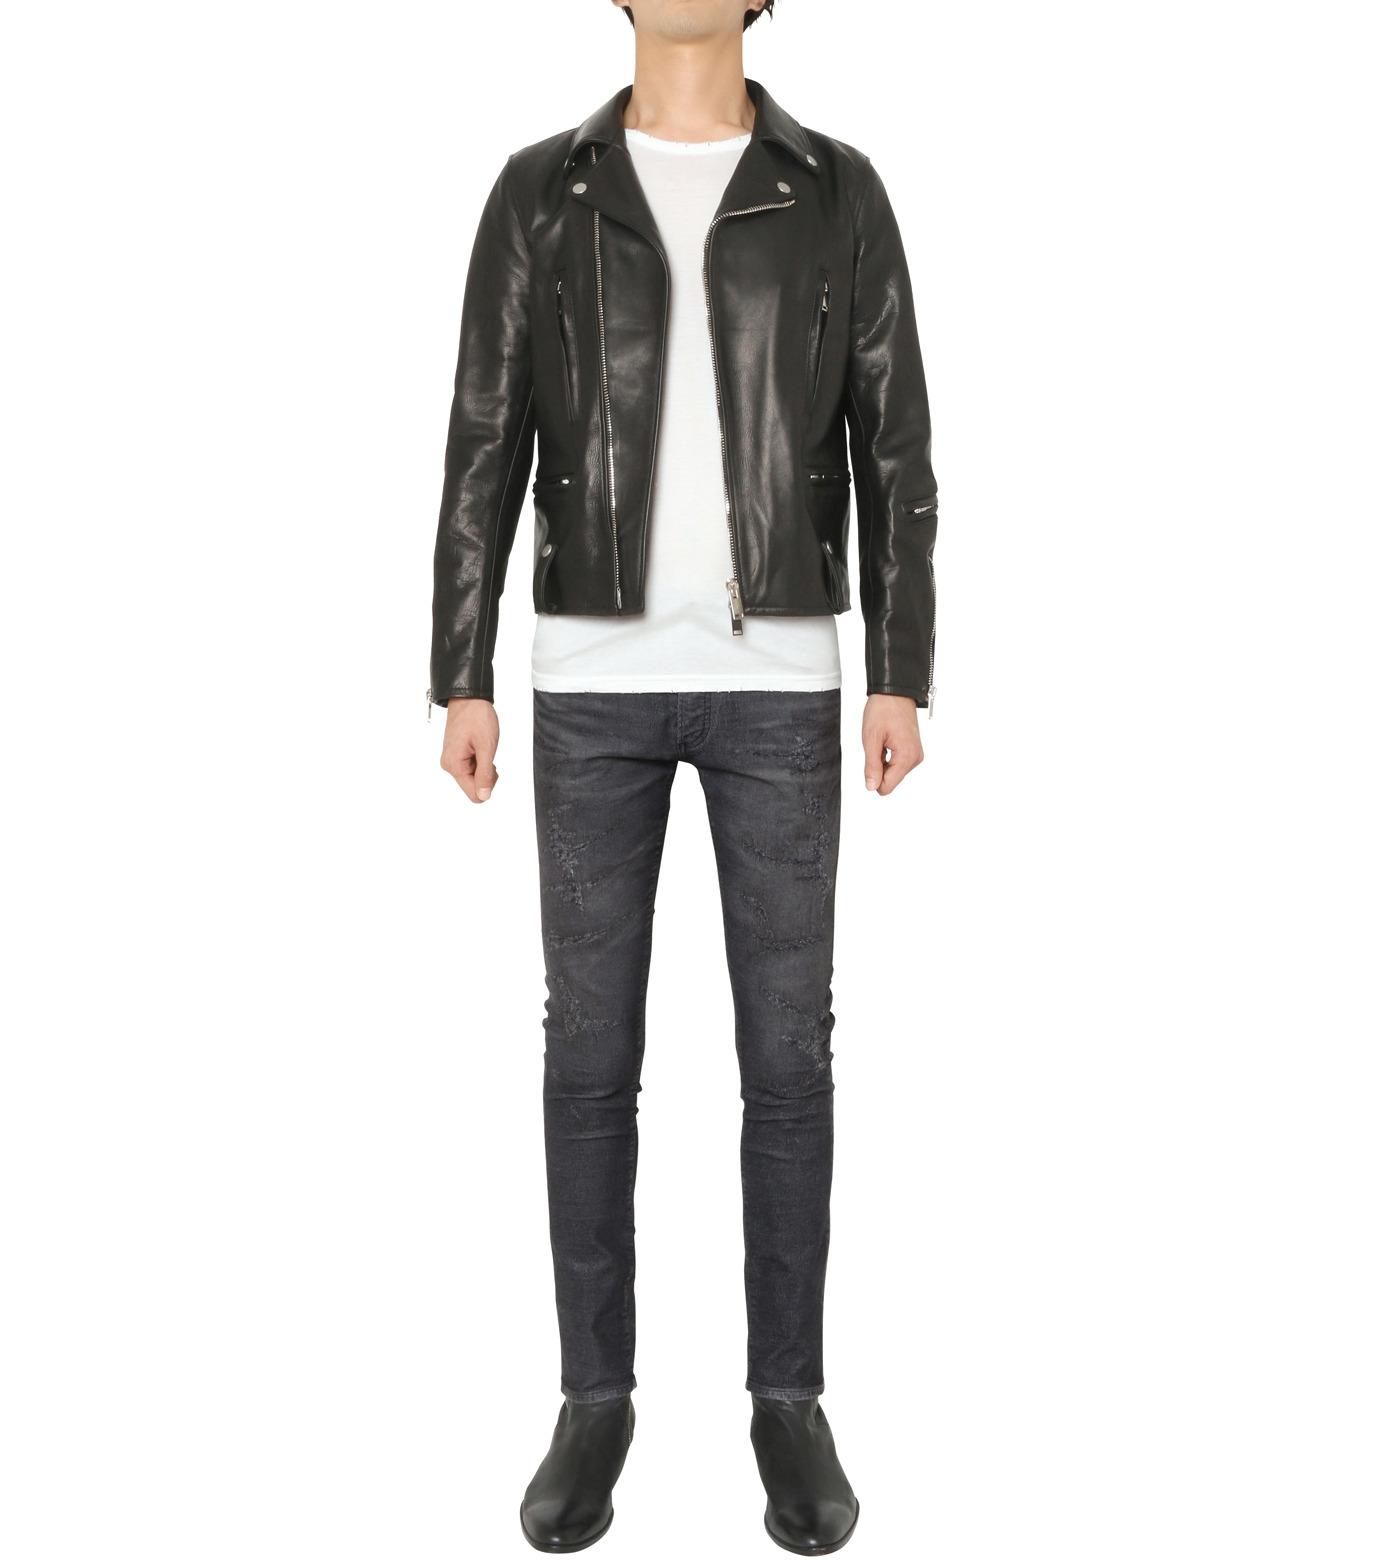 HL HEDDIE LOVU(エイチエル・エディールーヴ)のSEMI DOUBLE RIDERS JACKET-BLACK(ジャケット/jacket)-18A94001-13 拡大詳細画像2